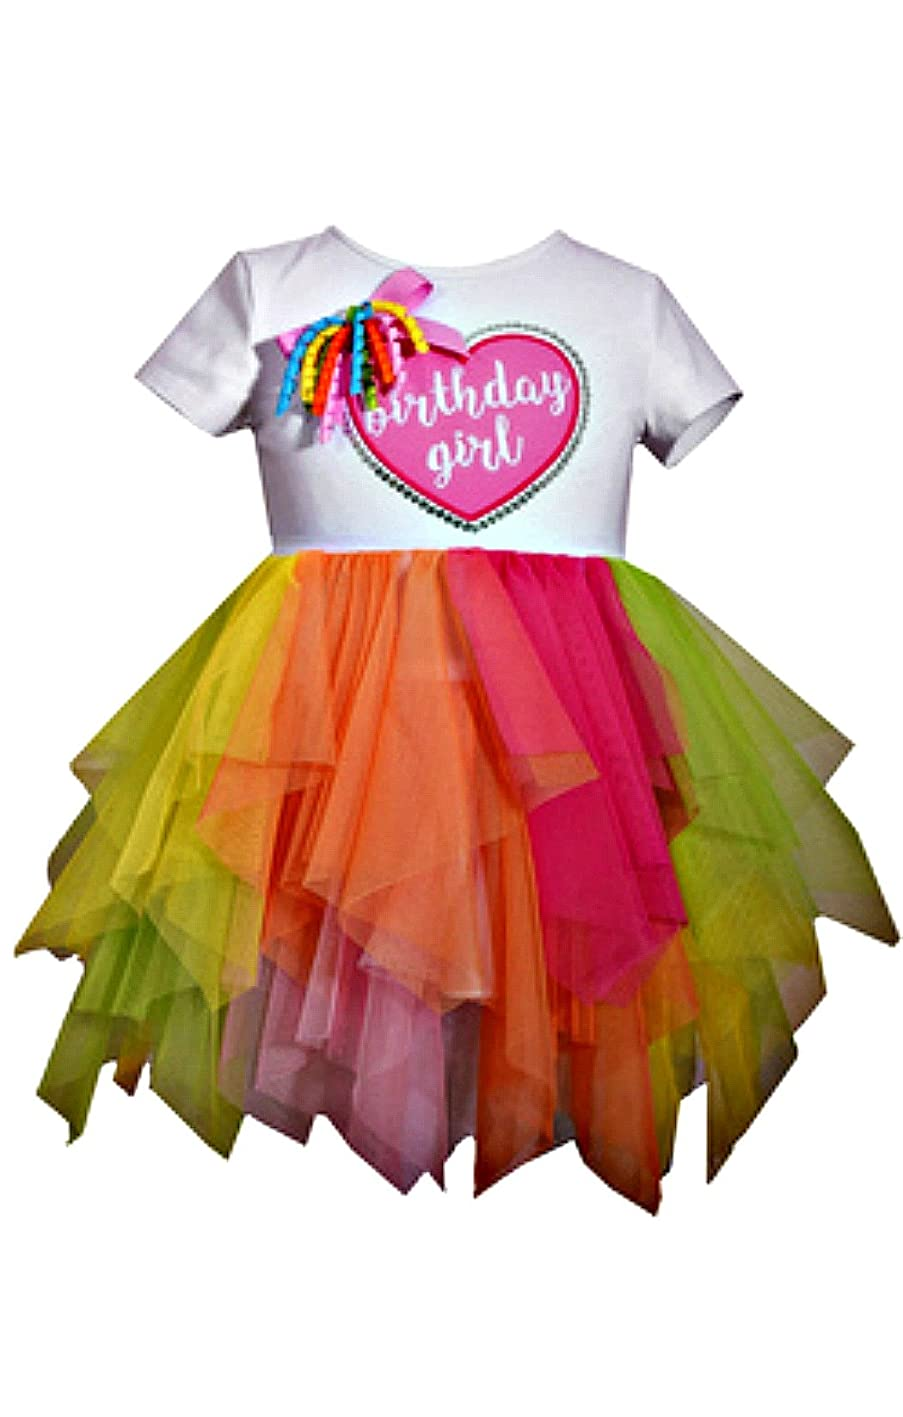 Bonnie Baby First Birthday Girl's Heart Tutu Dress,1st Girls Birthday jvmfqcdeqtz805